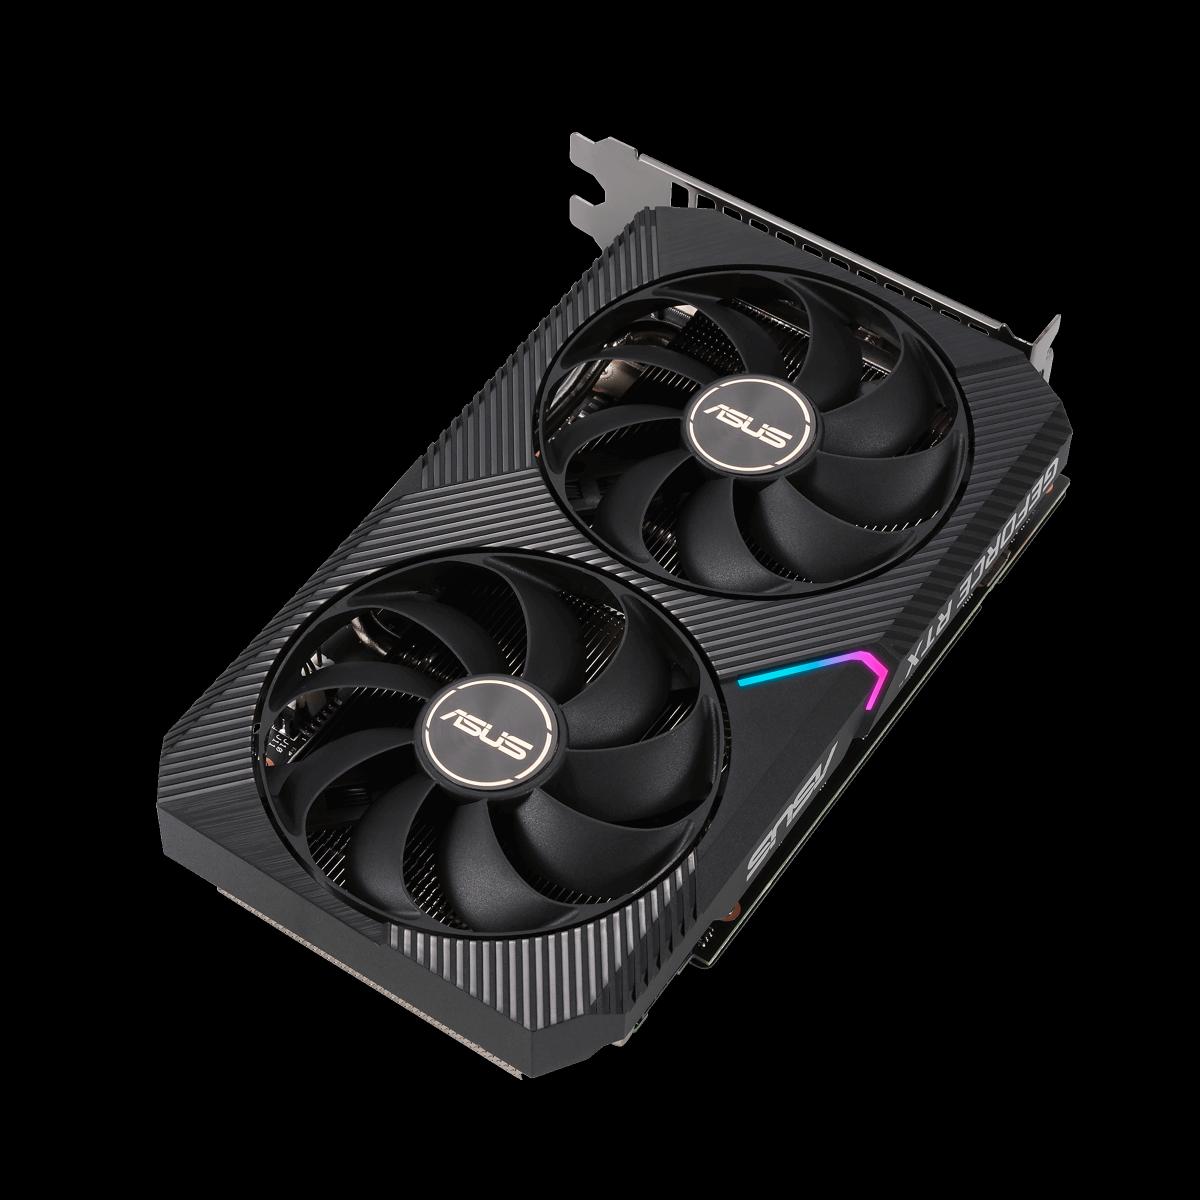 Placa de Vídeo Asus GeForce RTX 3060 OC, 12GB, GDDR6, 192bit, DUAL-RTX3060-O12G